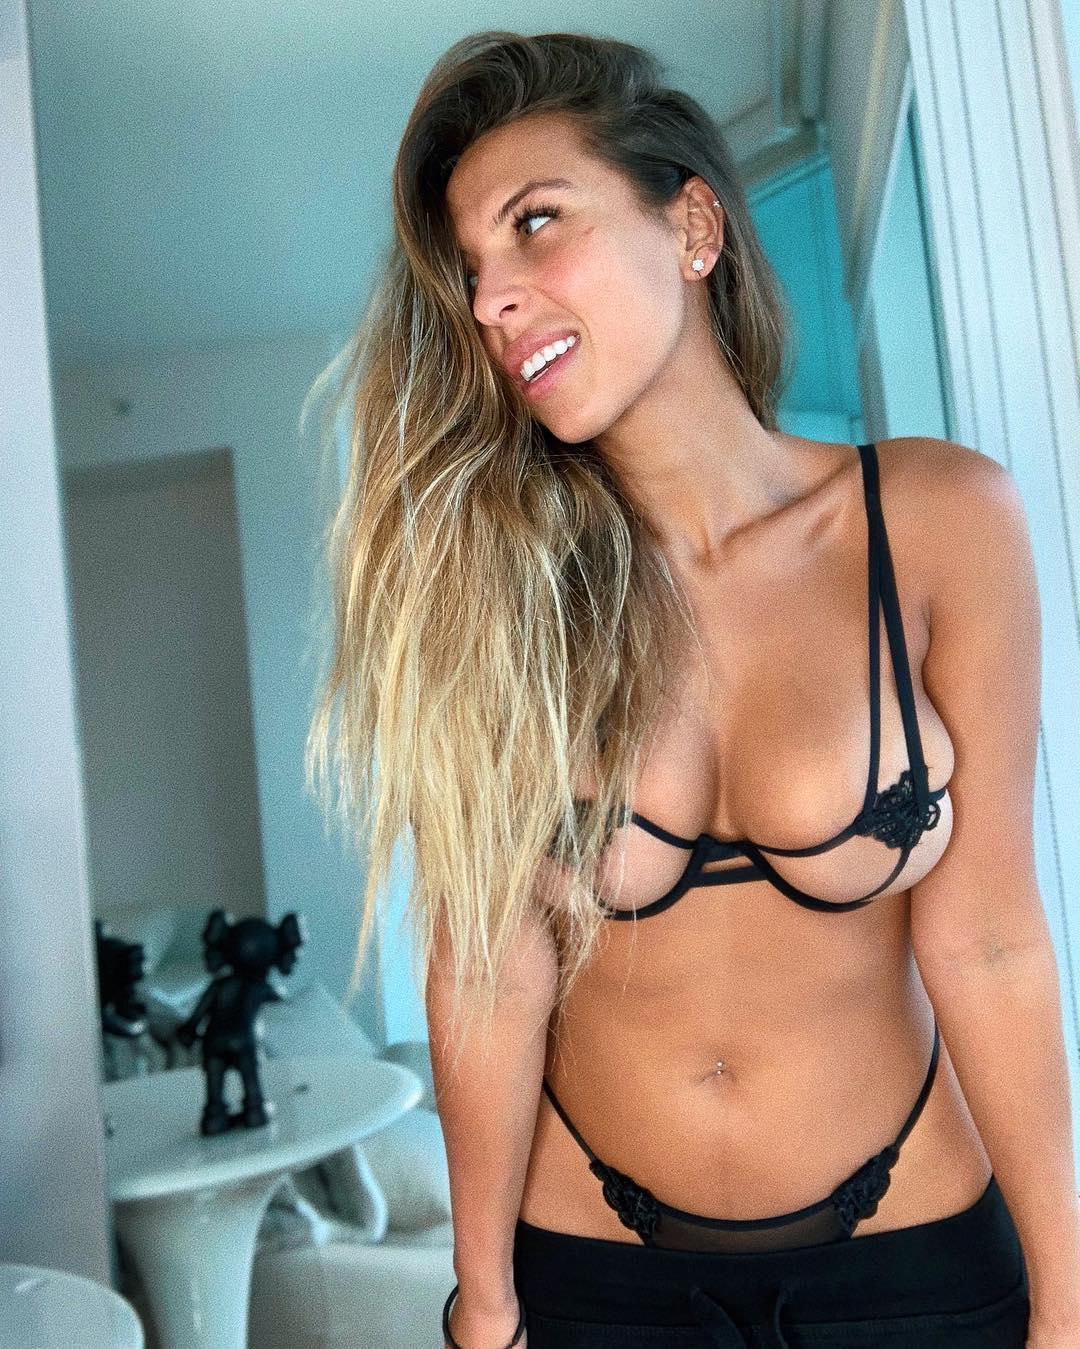 Natalia Garibotto Nude Onlyfans Leaked 0051